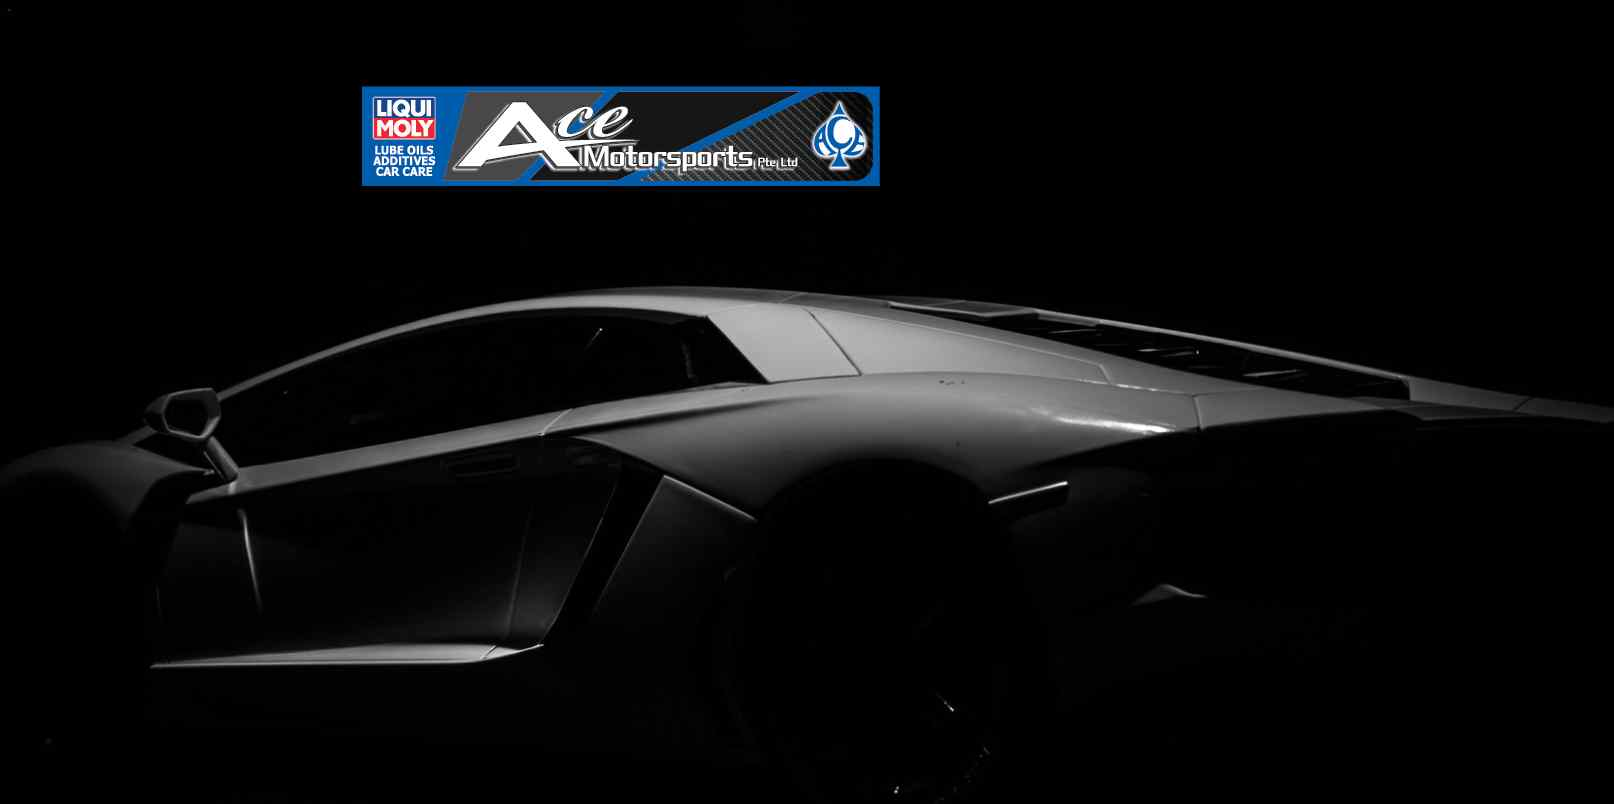 ace motorsports Top Car Servicing Workshops in Singapore